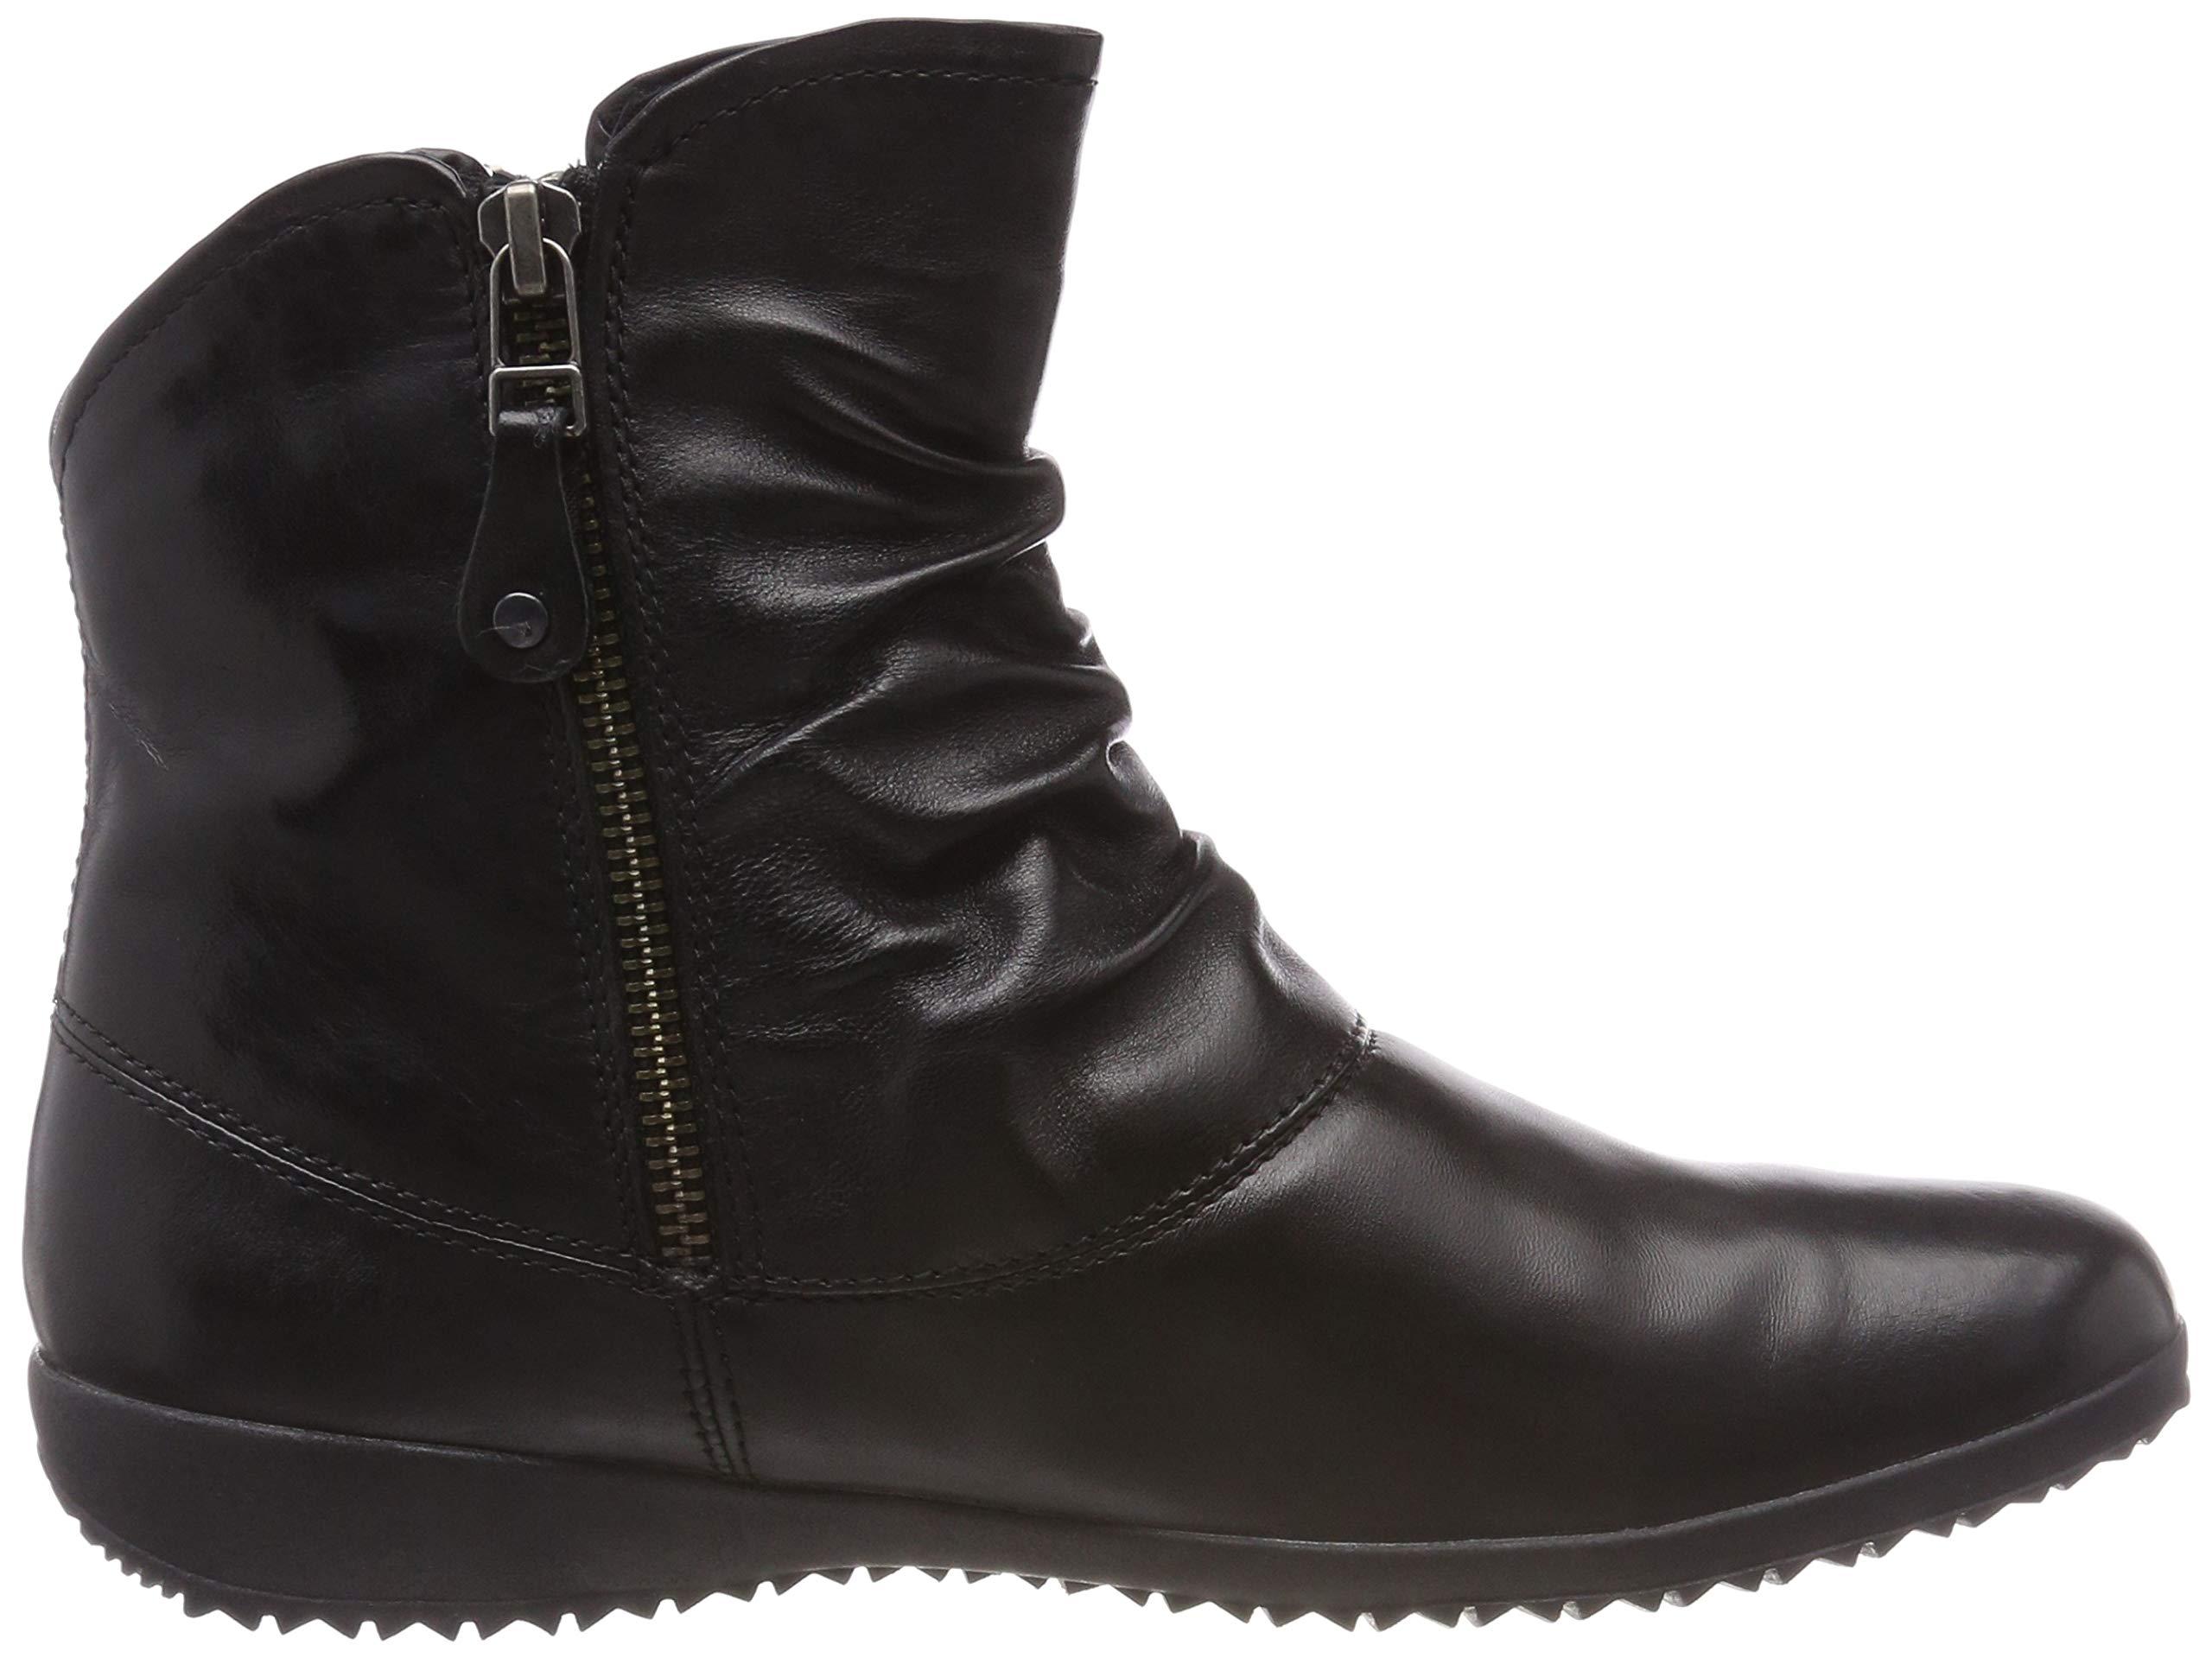 Josef Seibel Women's Naly 24 Slouch Boots 6